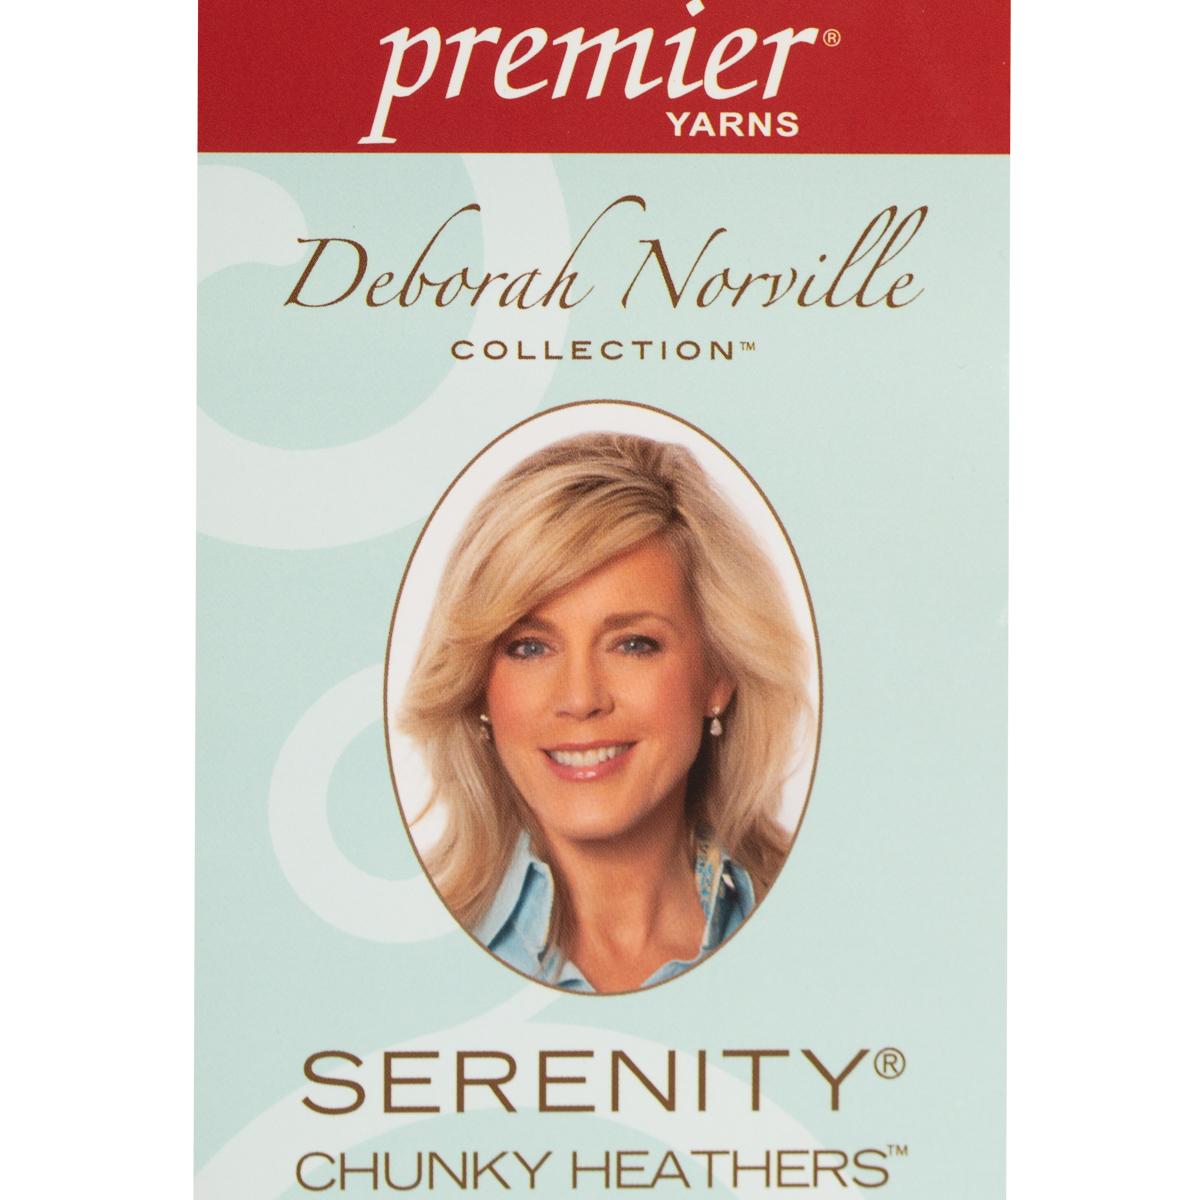 3pk-Premier-Yarns-Deborah-Norville-Serenity-100-Acrylic-Yarn-Chunky-5-Knitting thumbnail 16